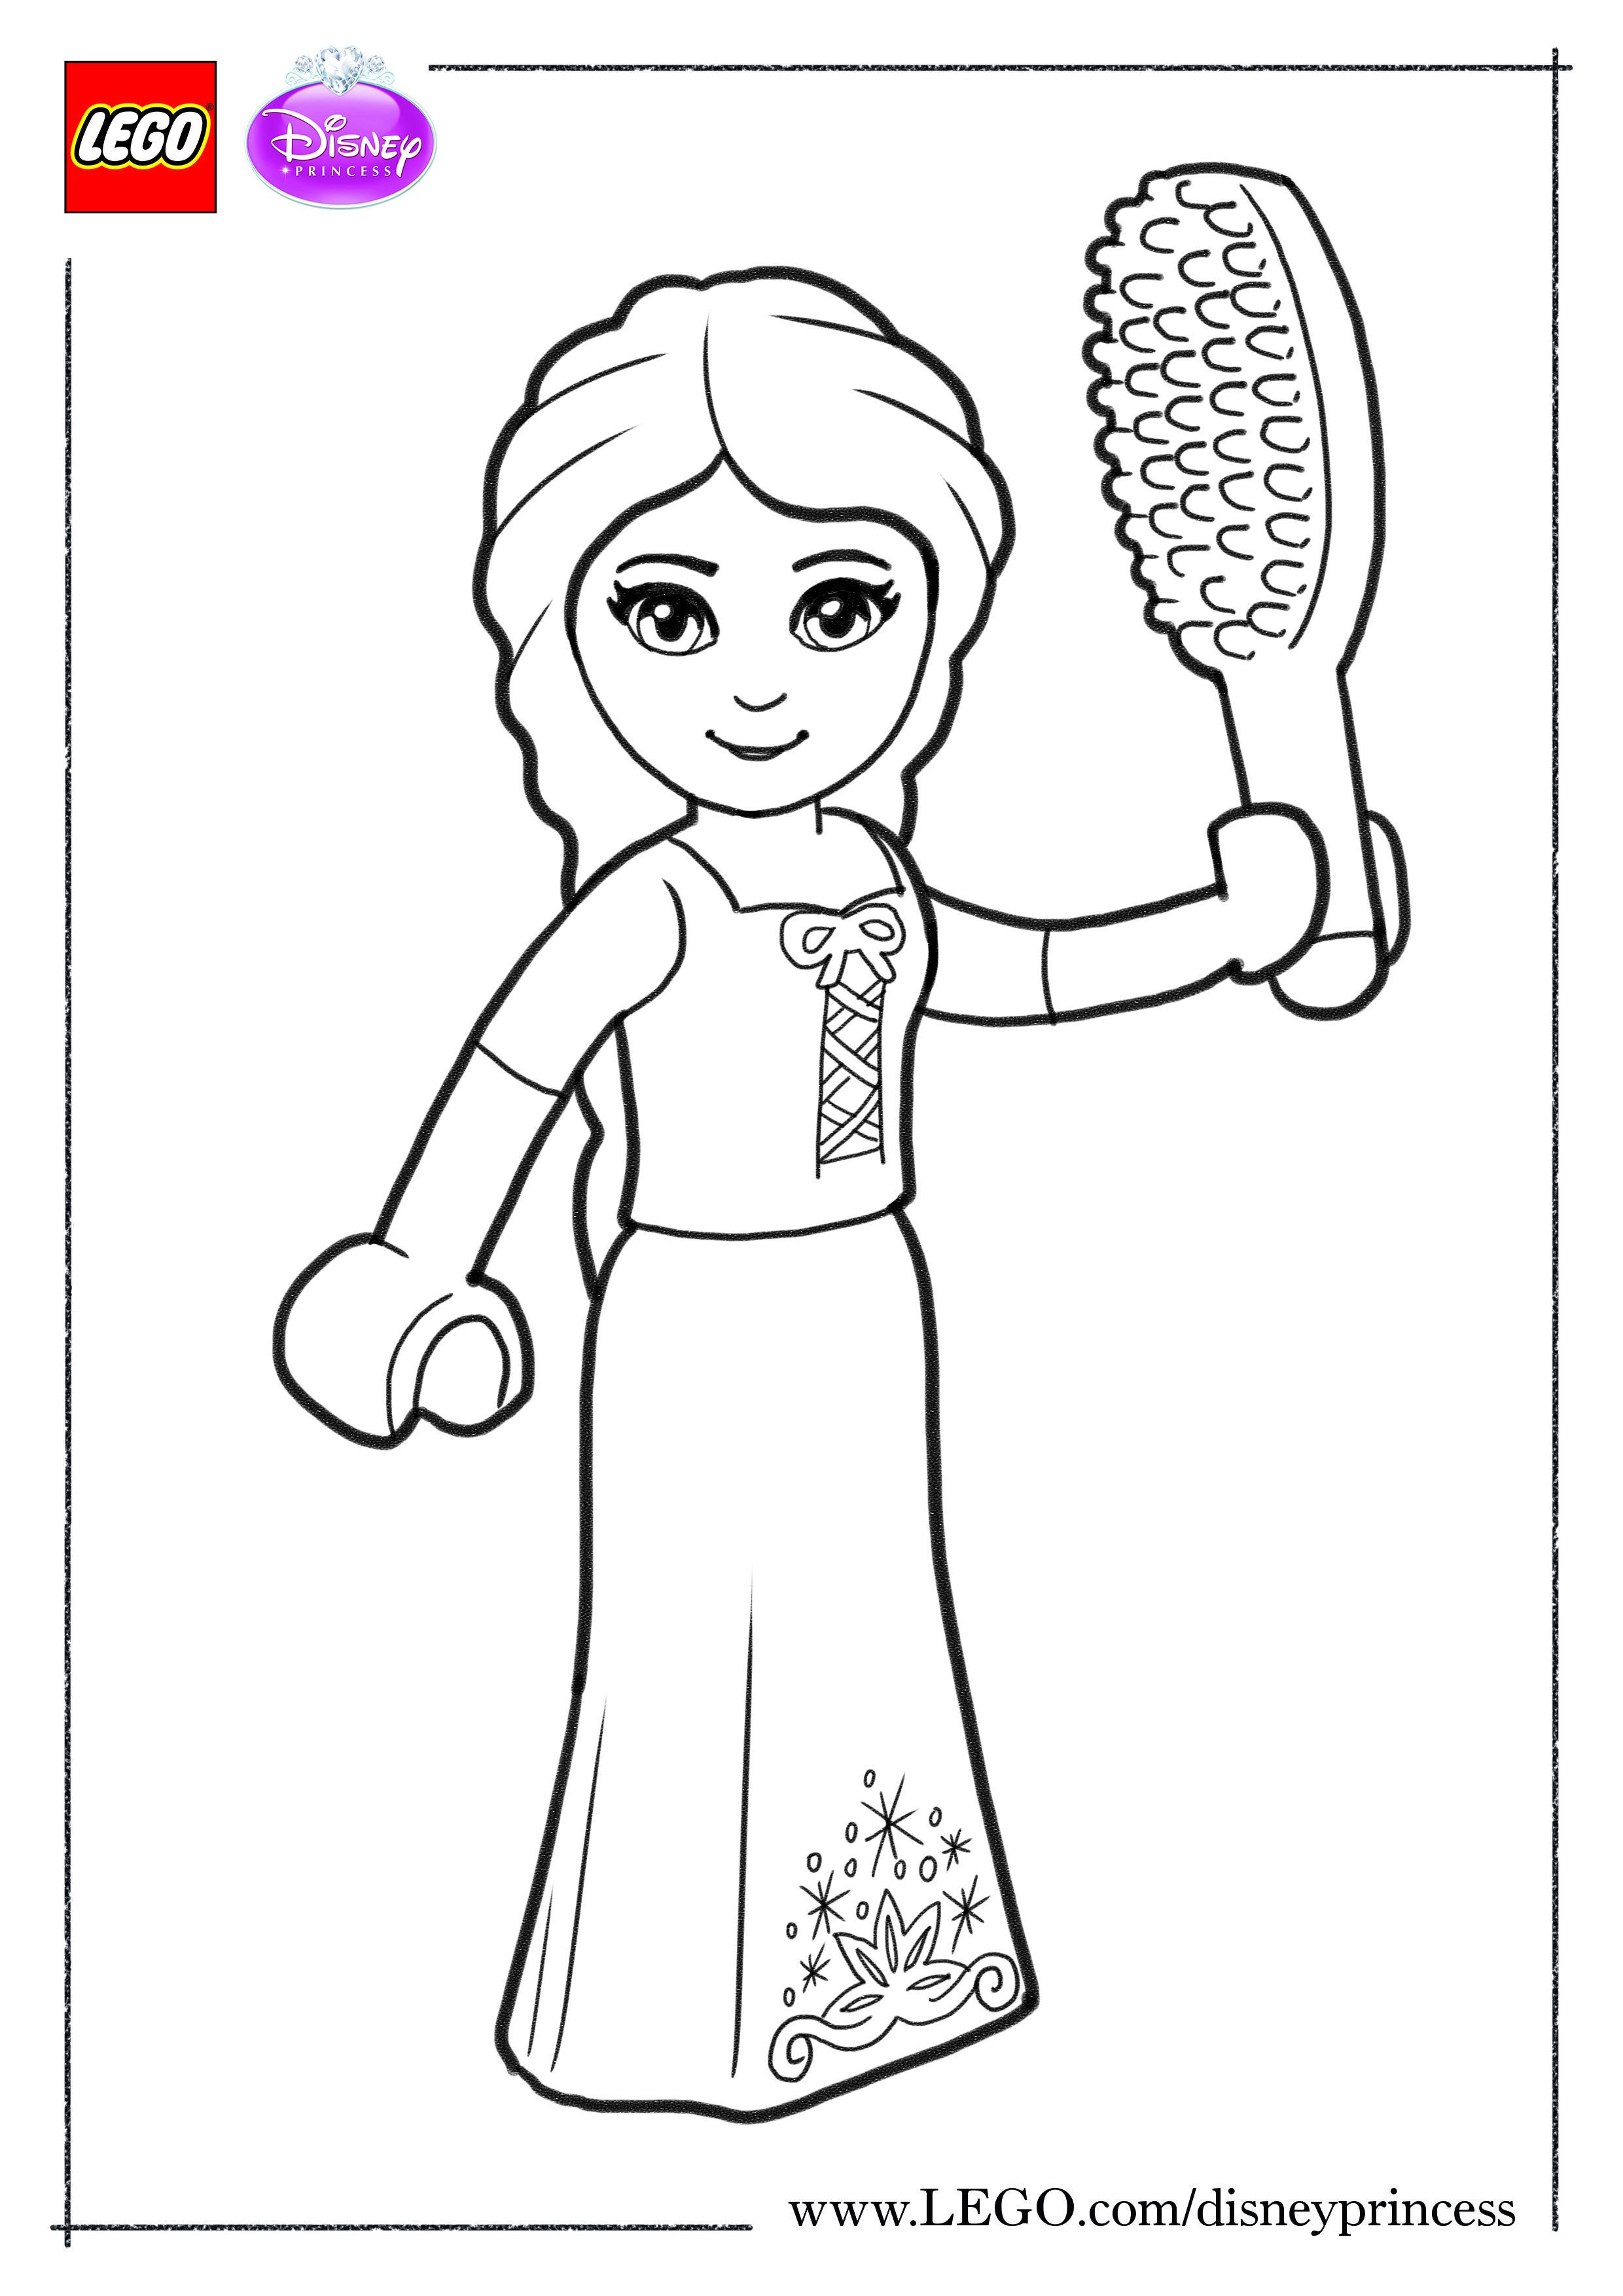 Print and colour our LEGO Disney Princess: #Rapunzel #